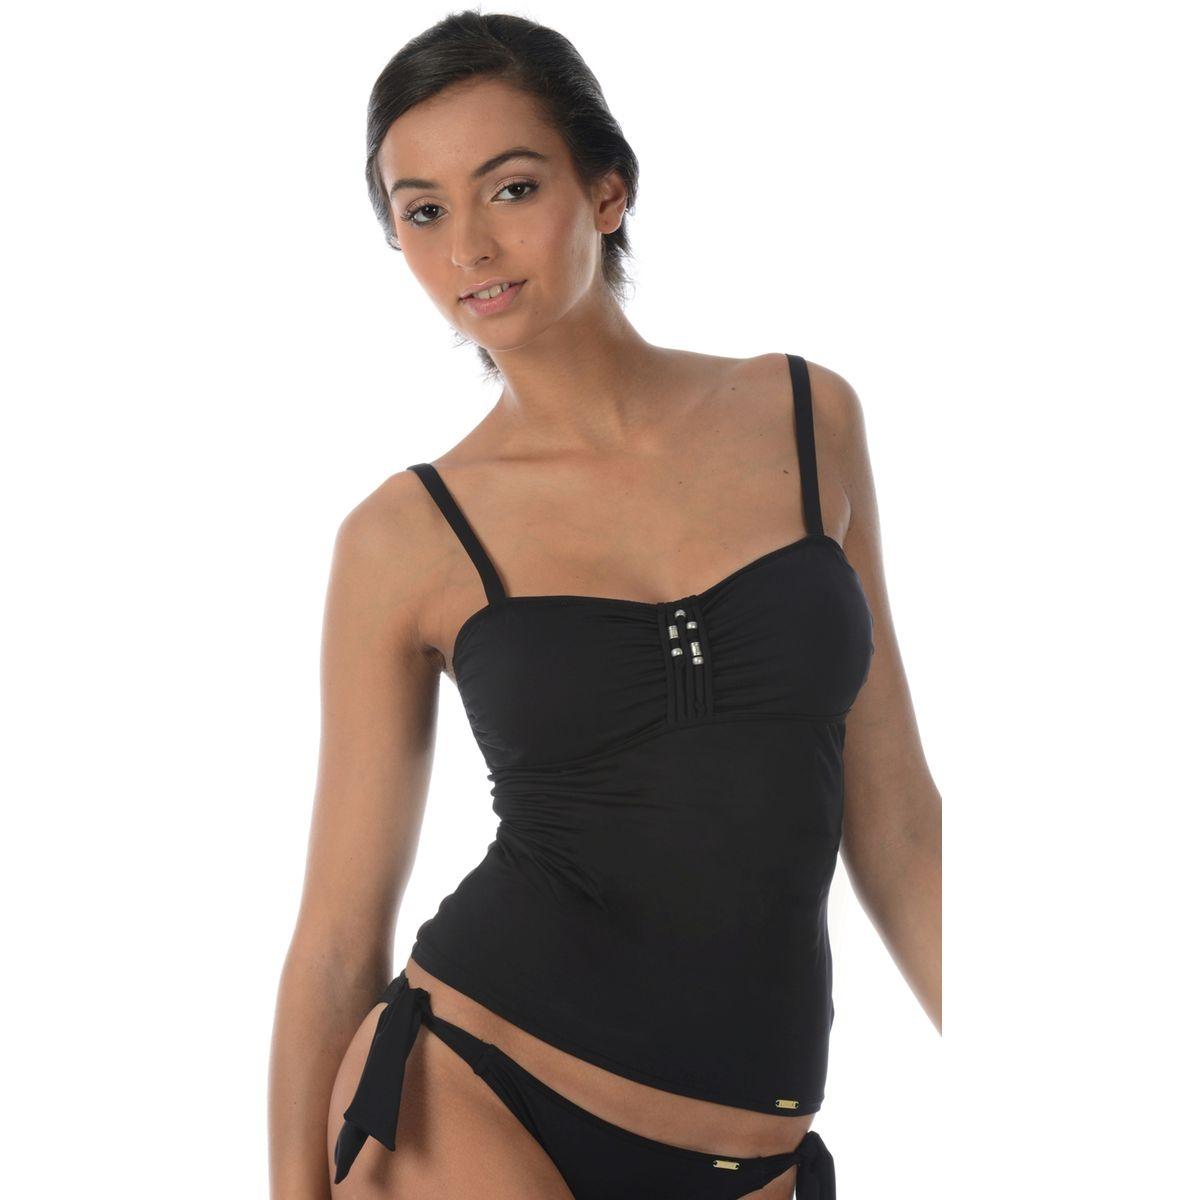 Haut de maillot de bain uni tankini DILCIA LAVANDOU. LIVIA 92360e788603